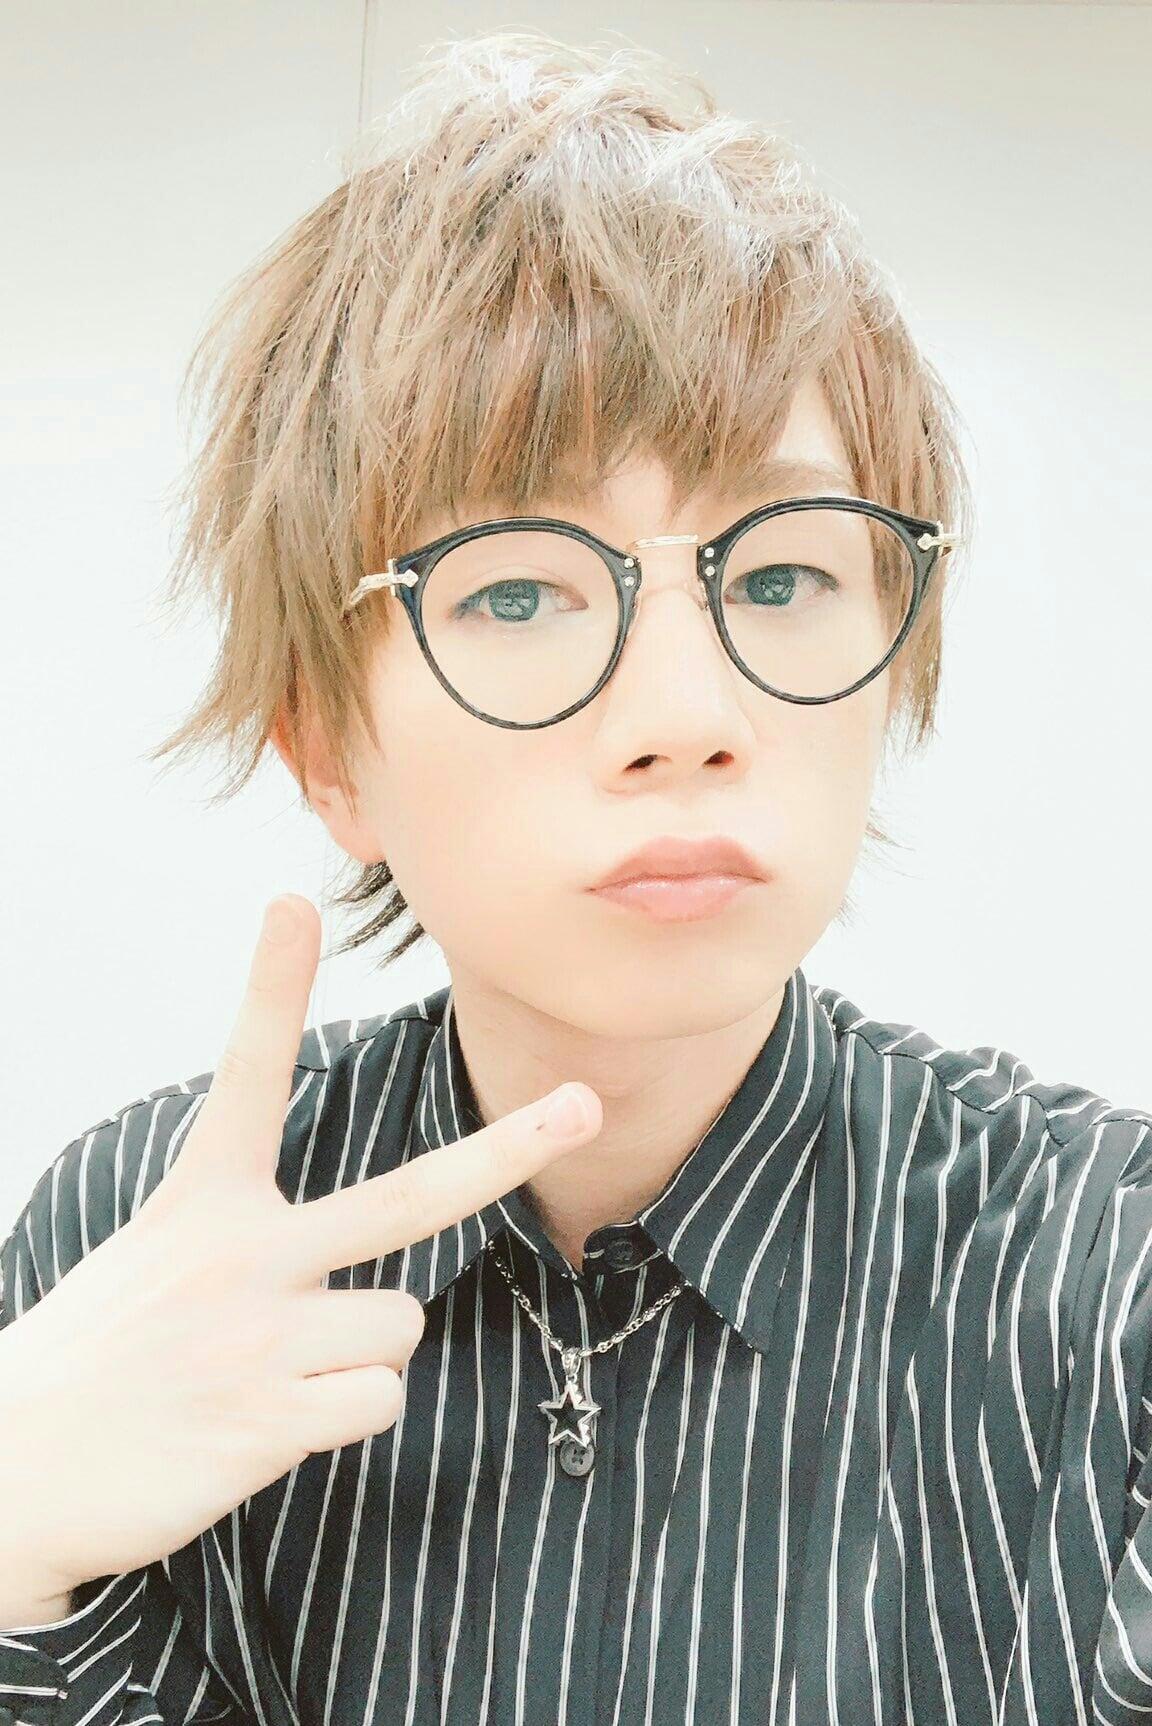 Takahashi Wataru